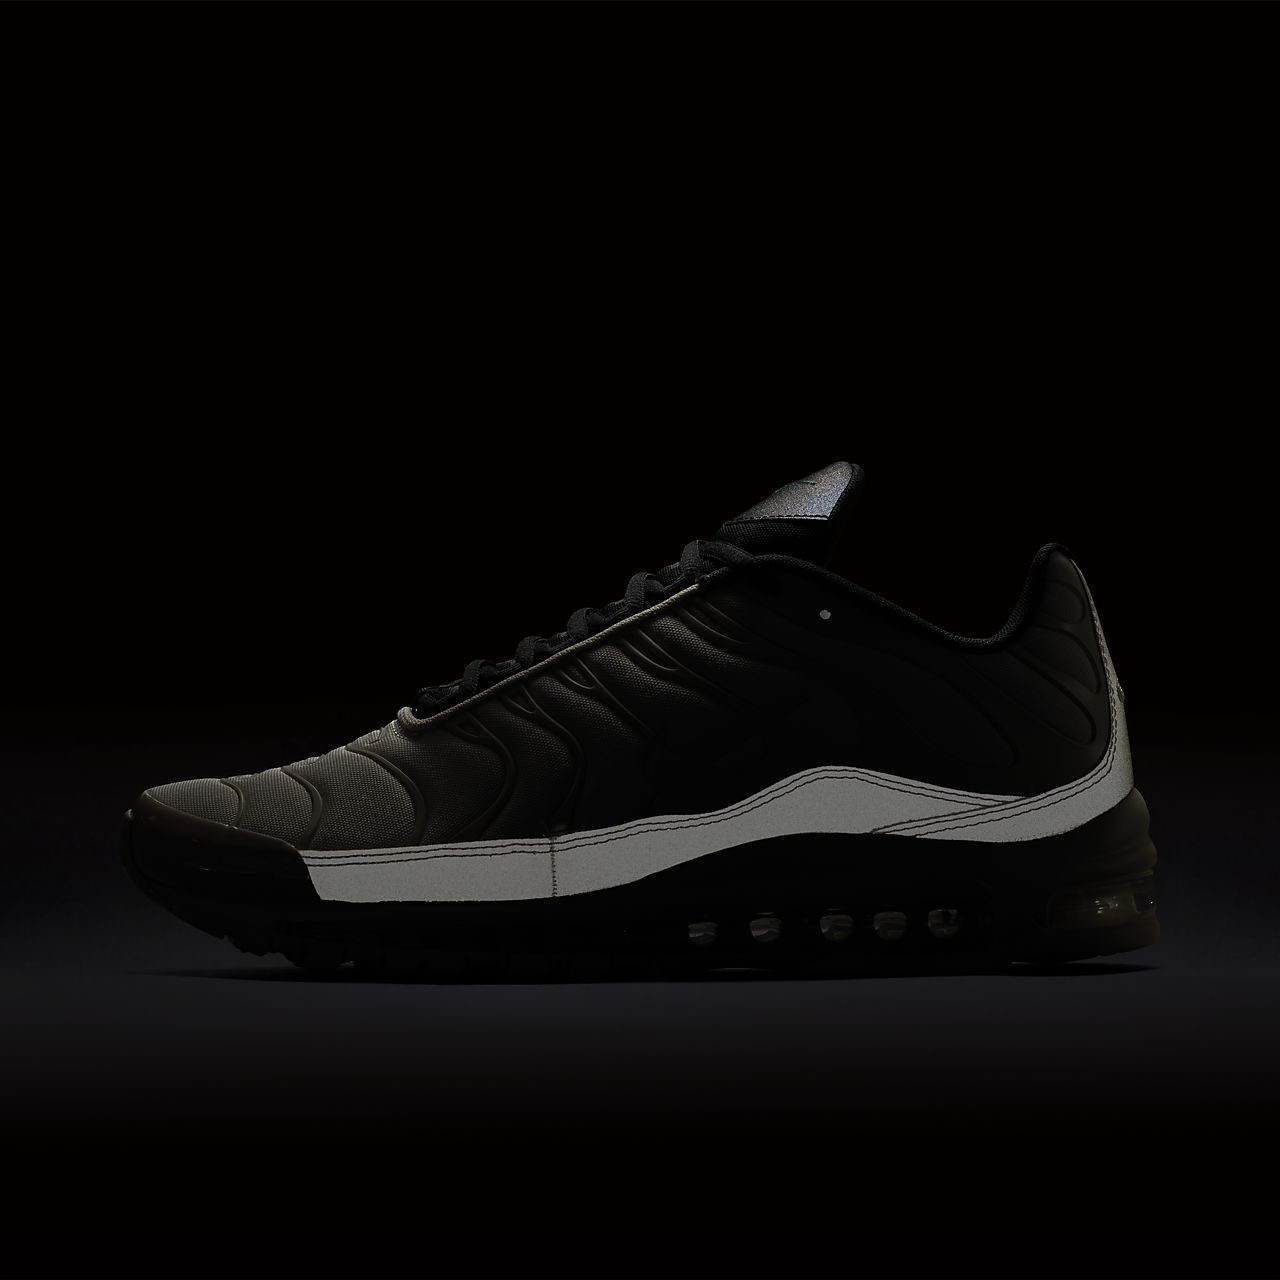 the latest a619f d4bb5 ... Sko Nike Air Max 97 Plus för män